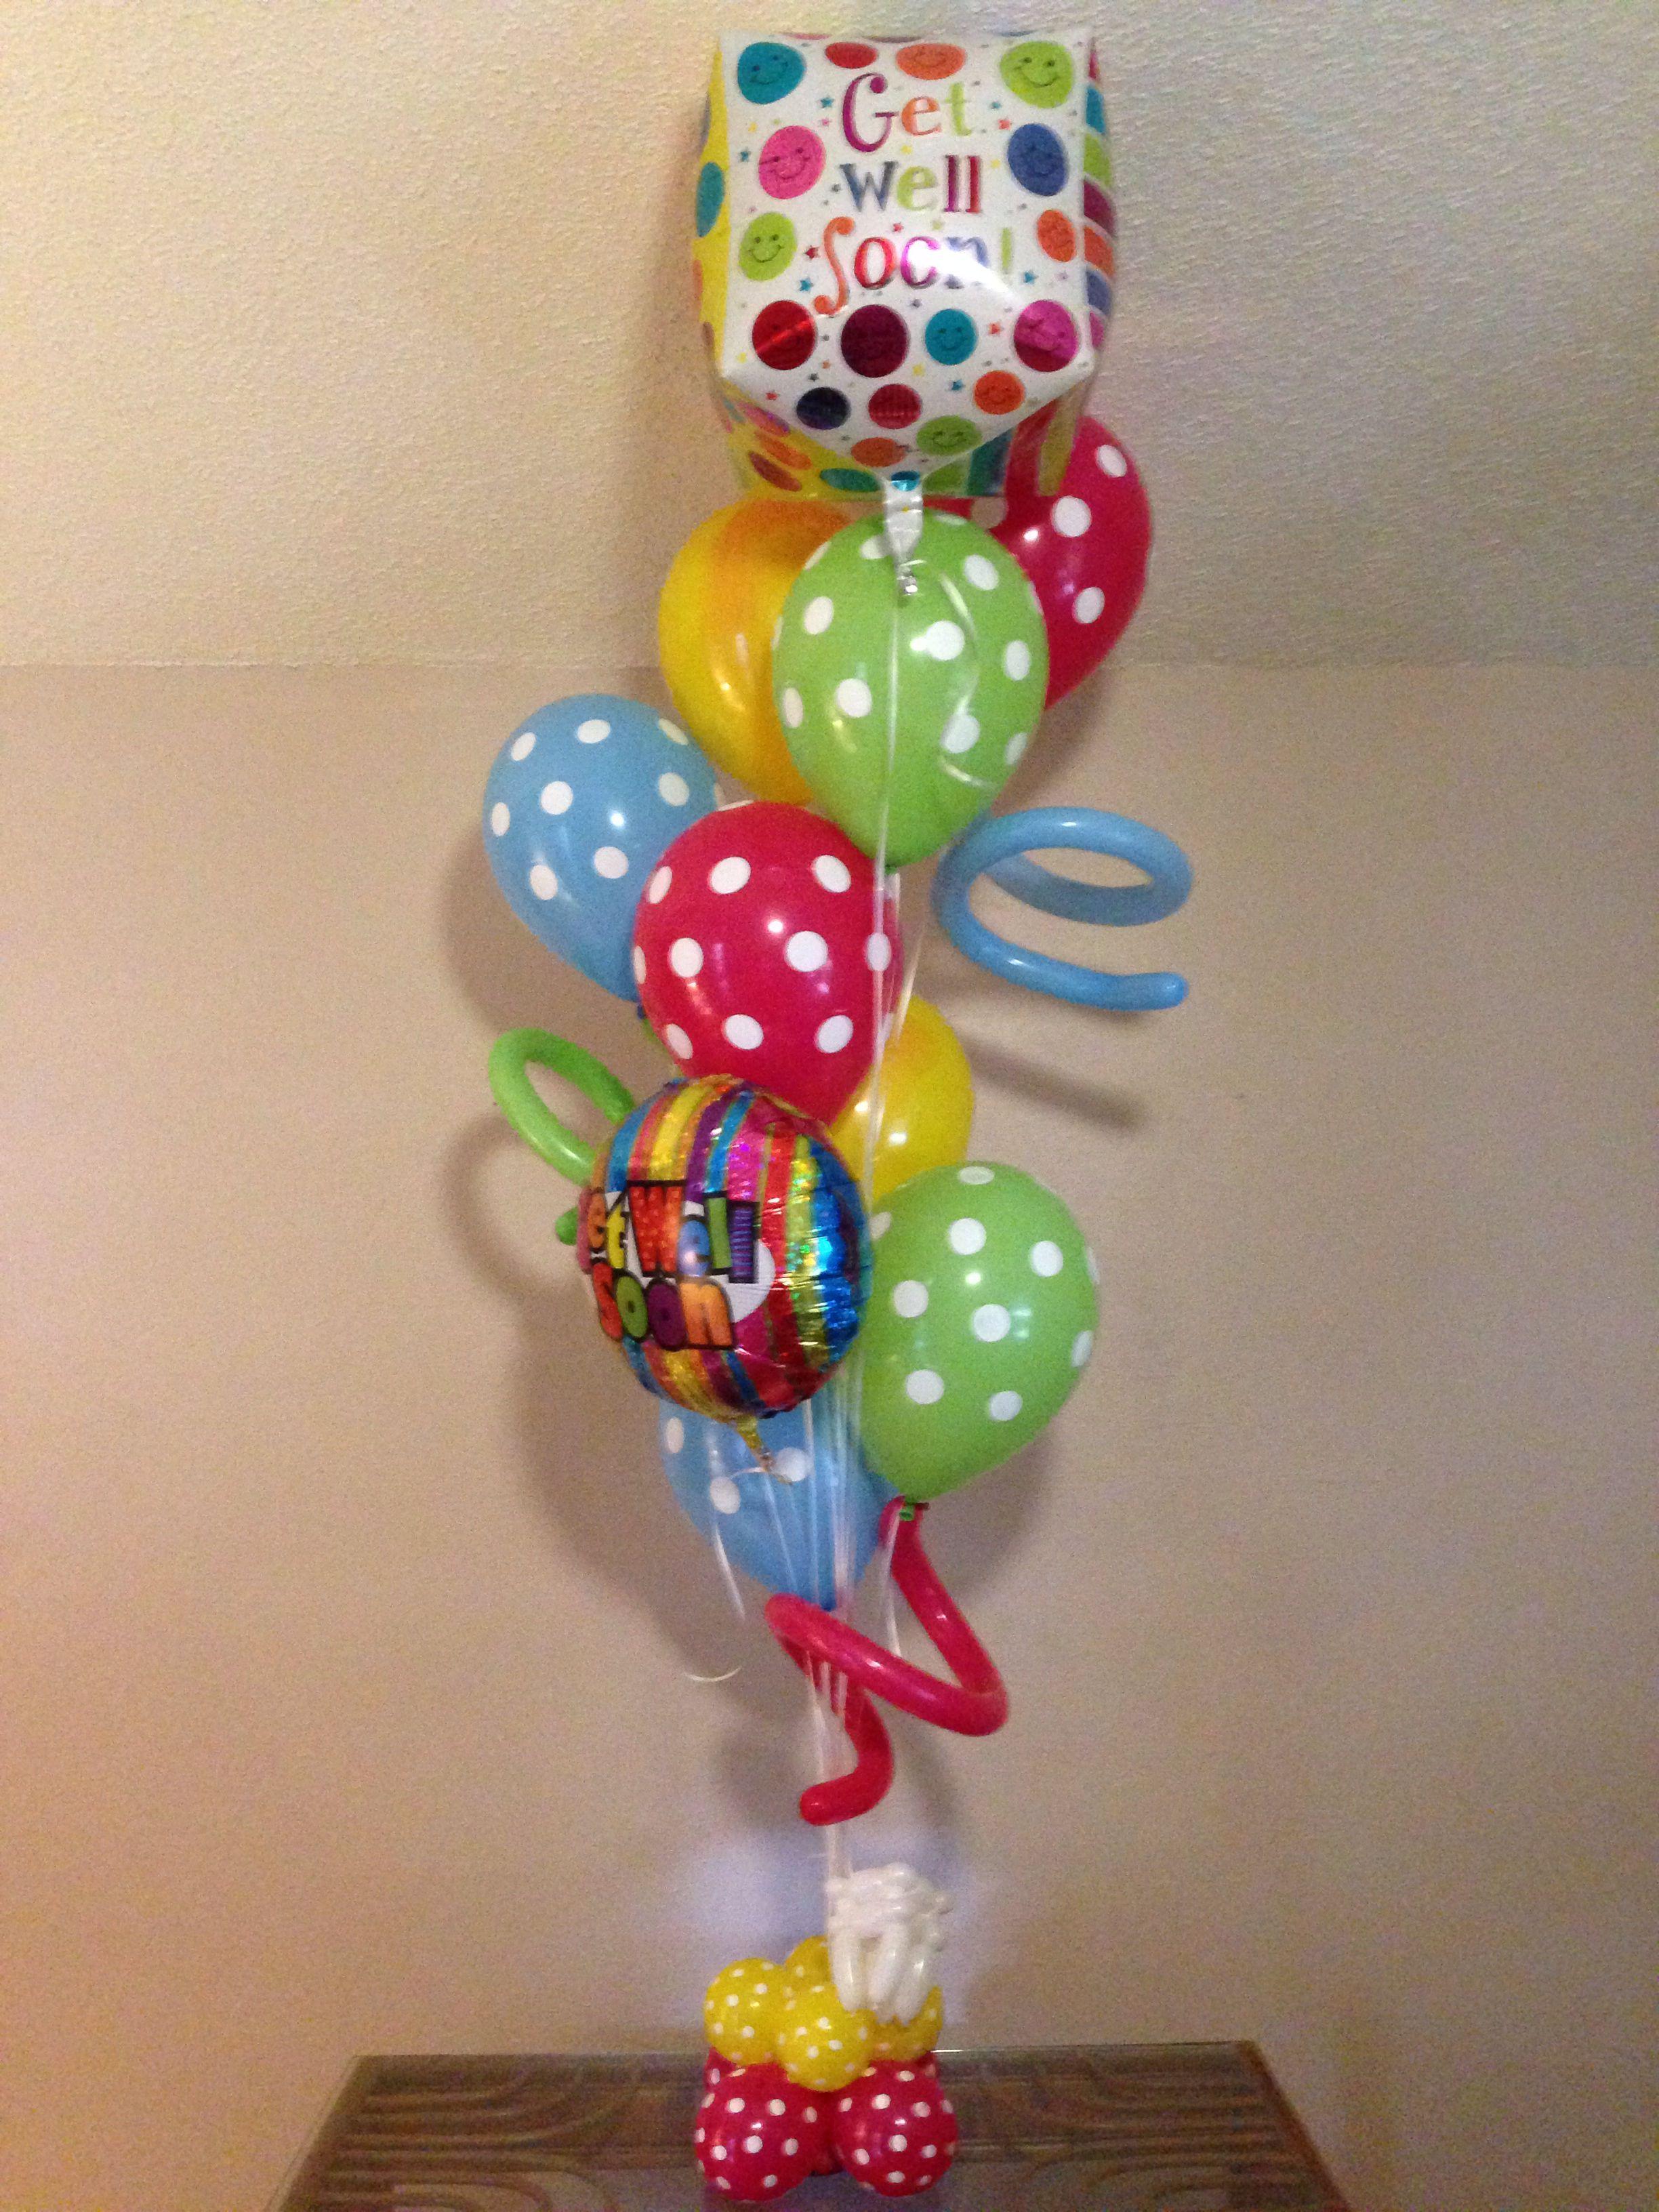 Get Well Balloon Bouquet Get Well Balloons Balloons And More Balloon Bouquet